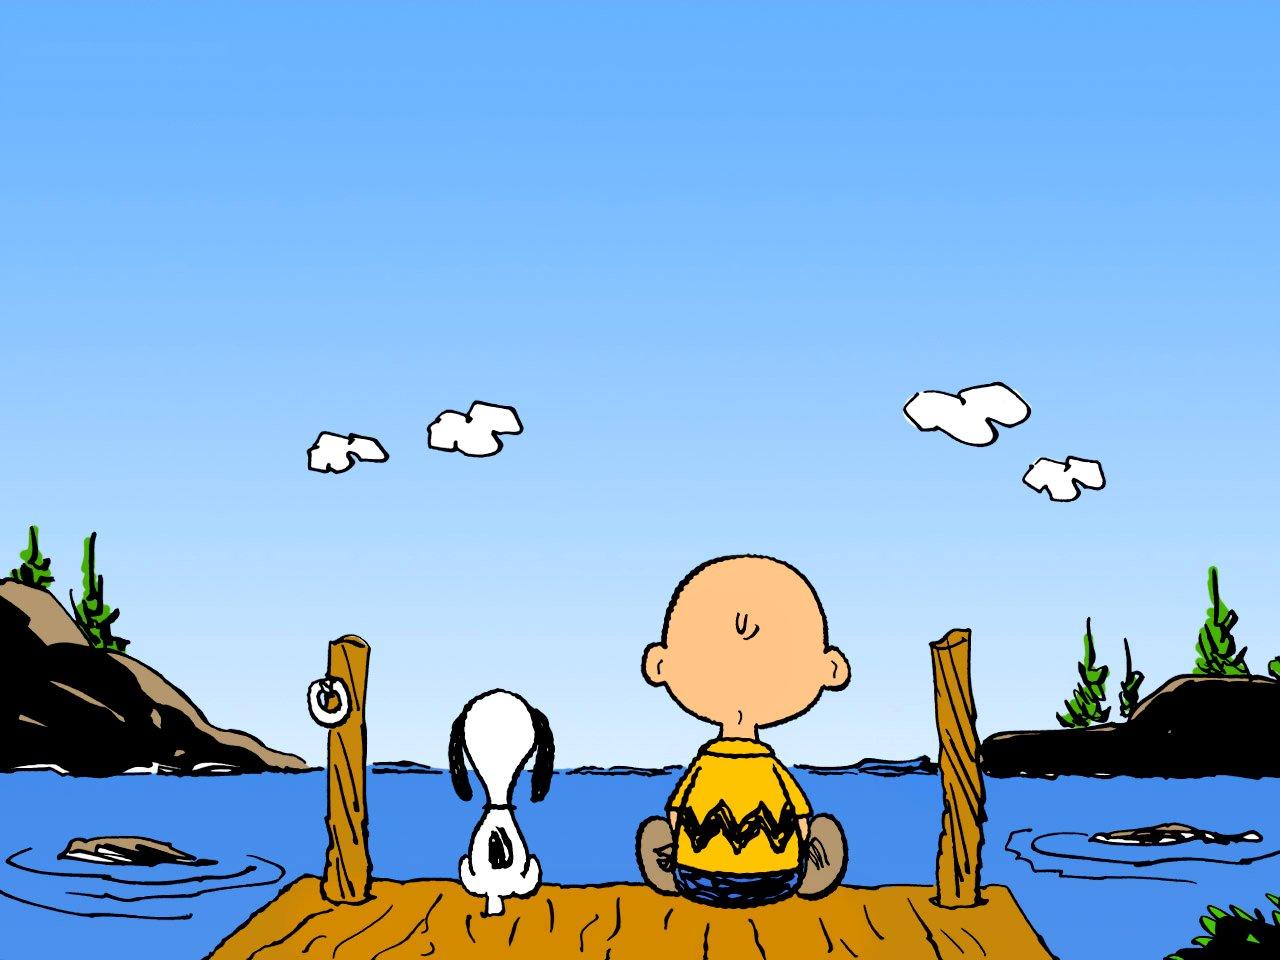 snoopy charlie brown peanuts comic strip desktop 1280x960 hd wallpaper 1280x960